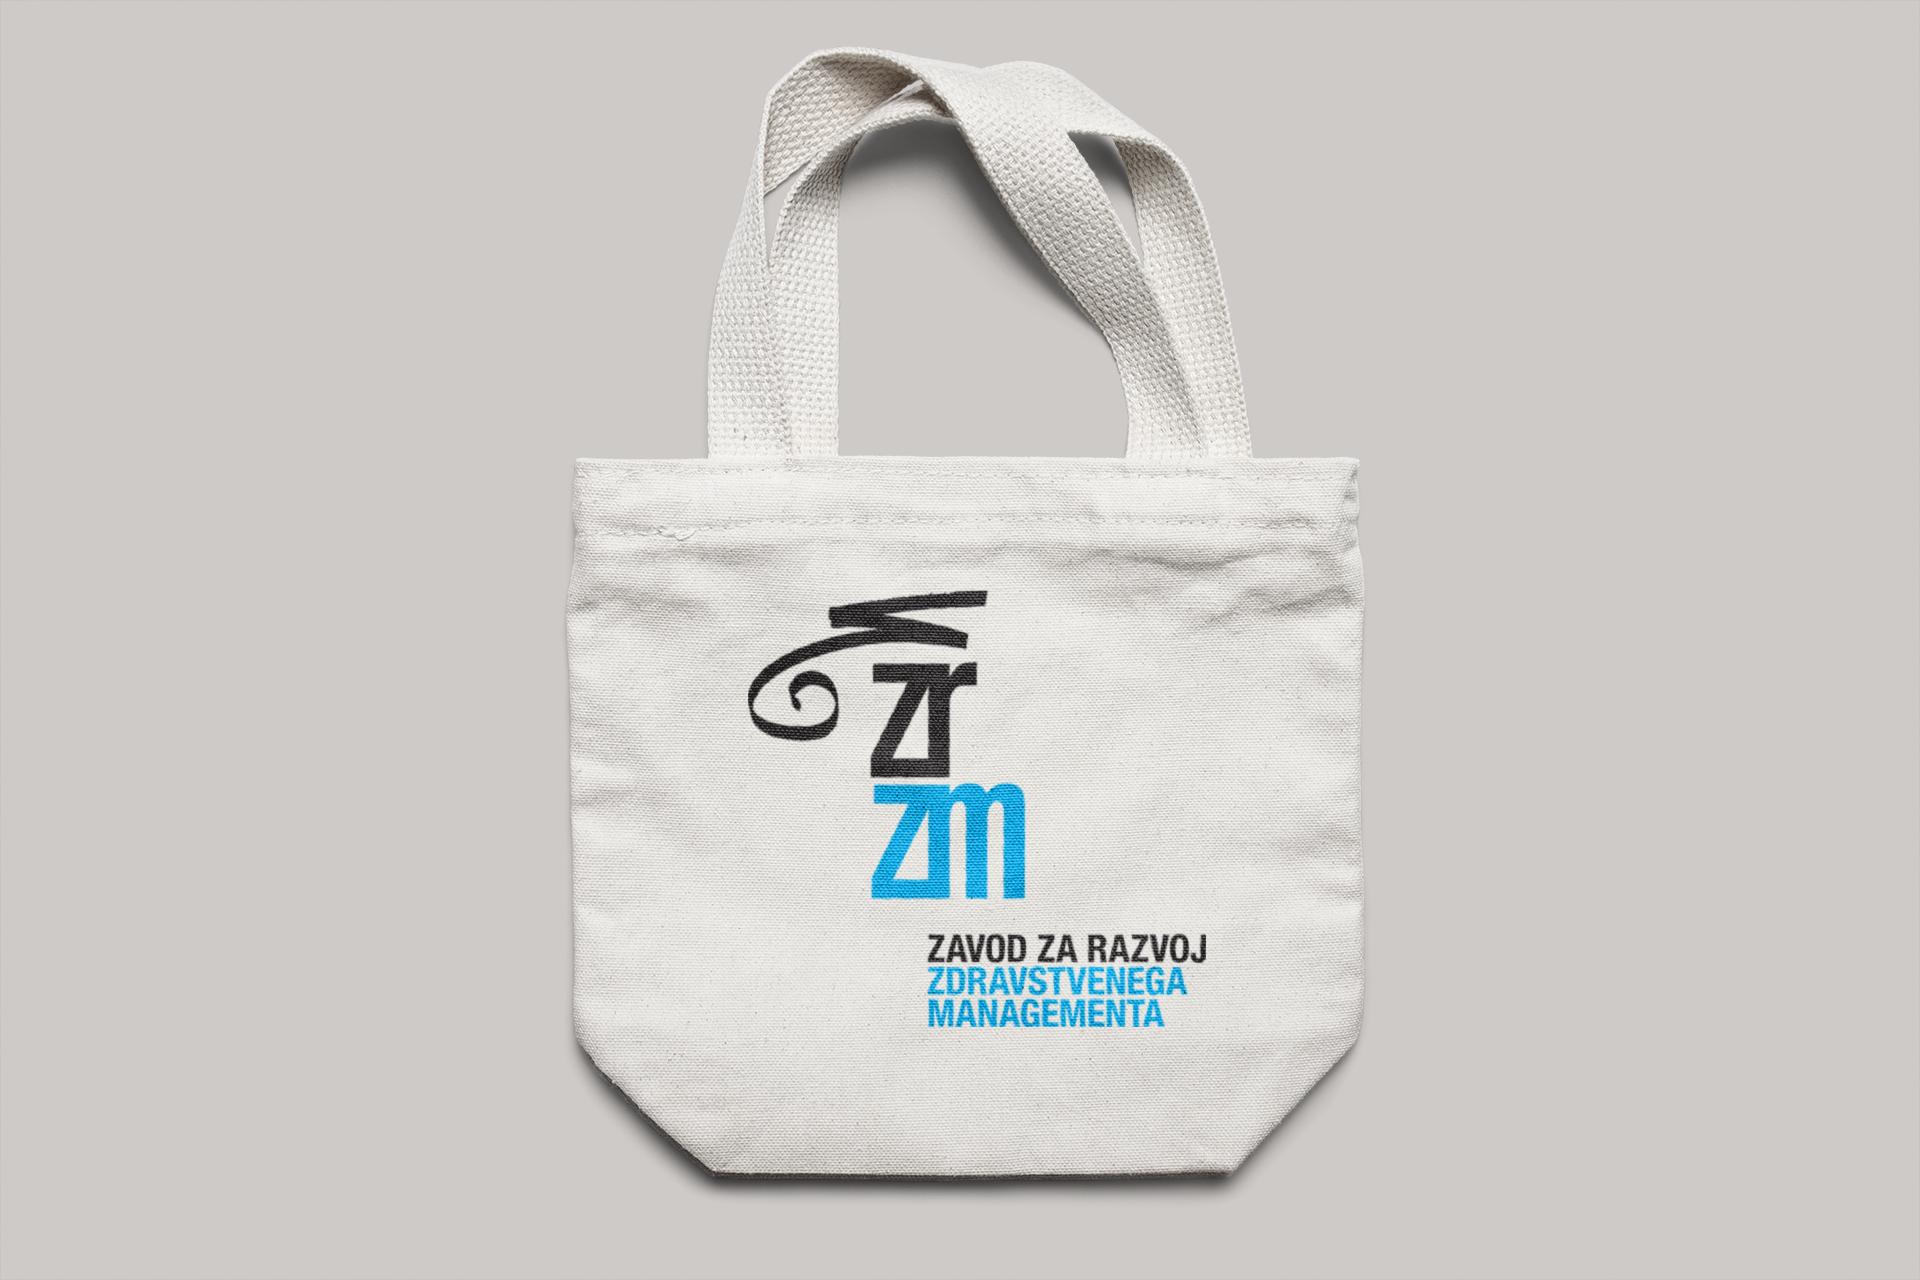 zrzm_logo_ma-ma_marinsek_vrecka